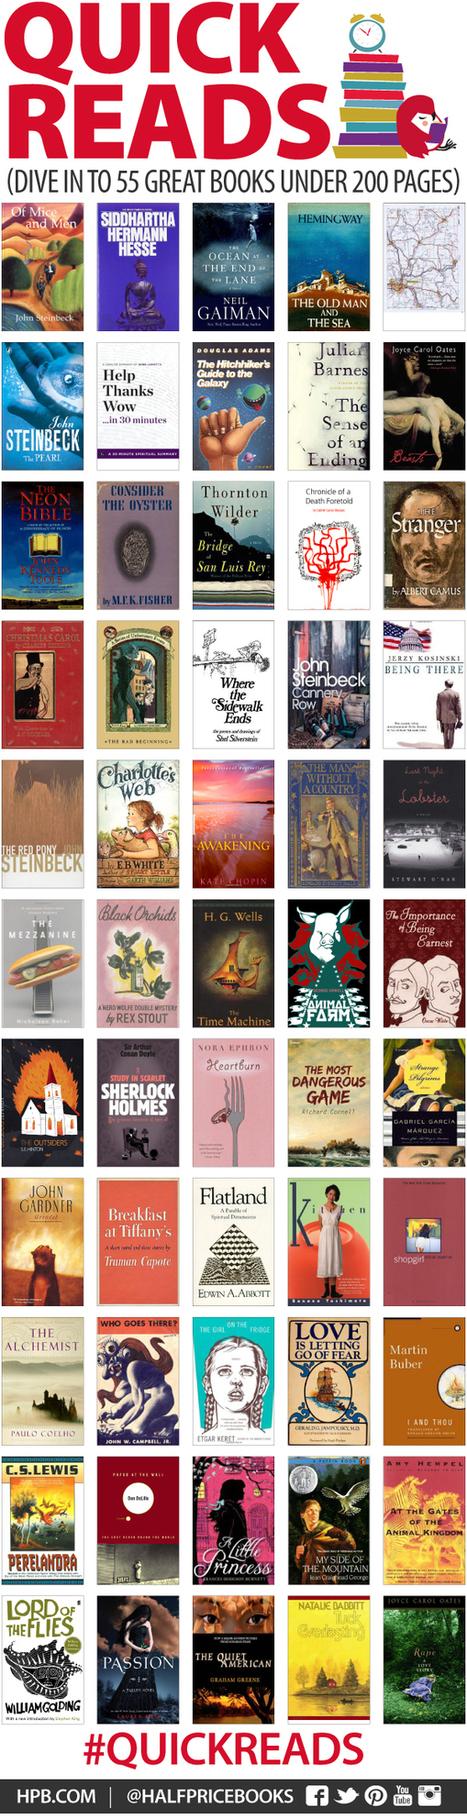 Quick Reads: 55 Books Under 200Pages - Half Price Books Blog - HPB.com | Literature | Scoop.it